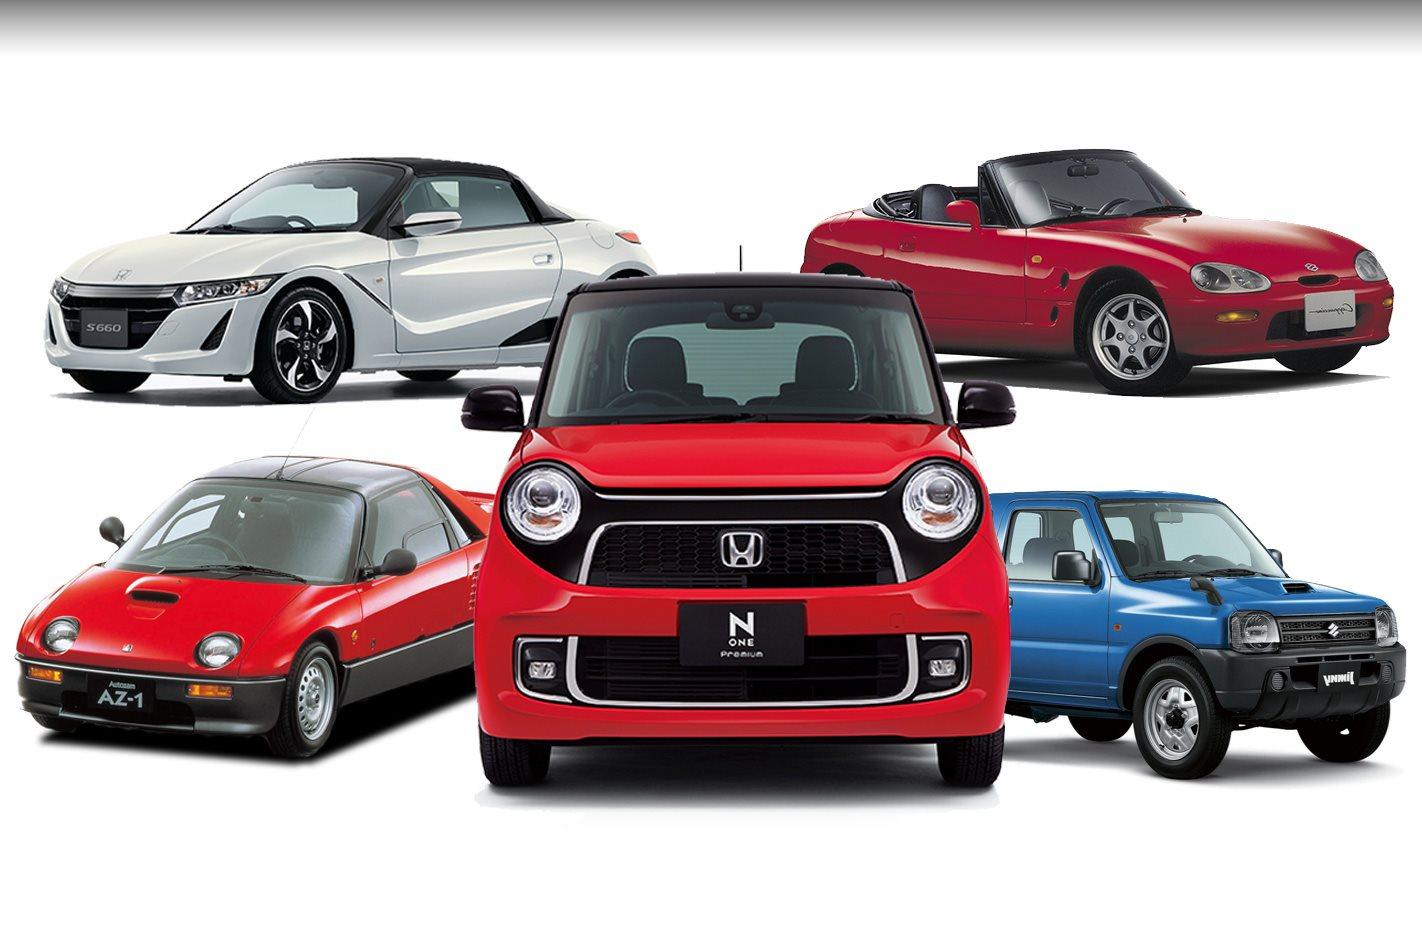 Best Nissan Street Racing Cars